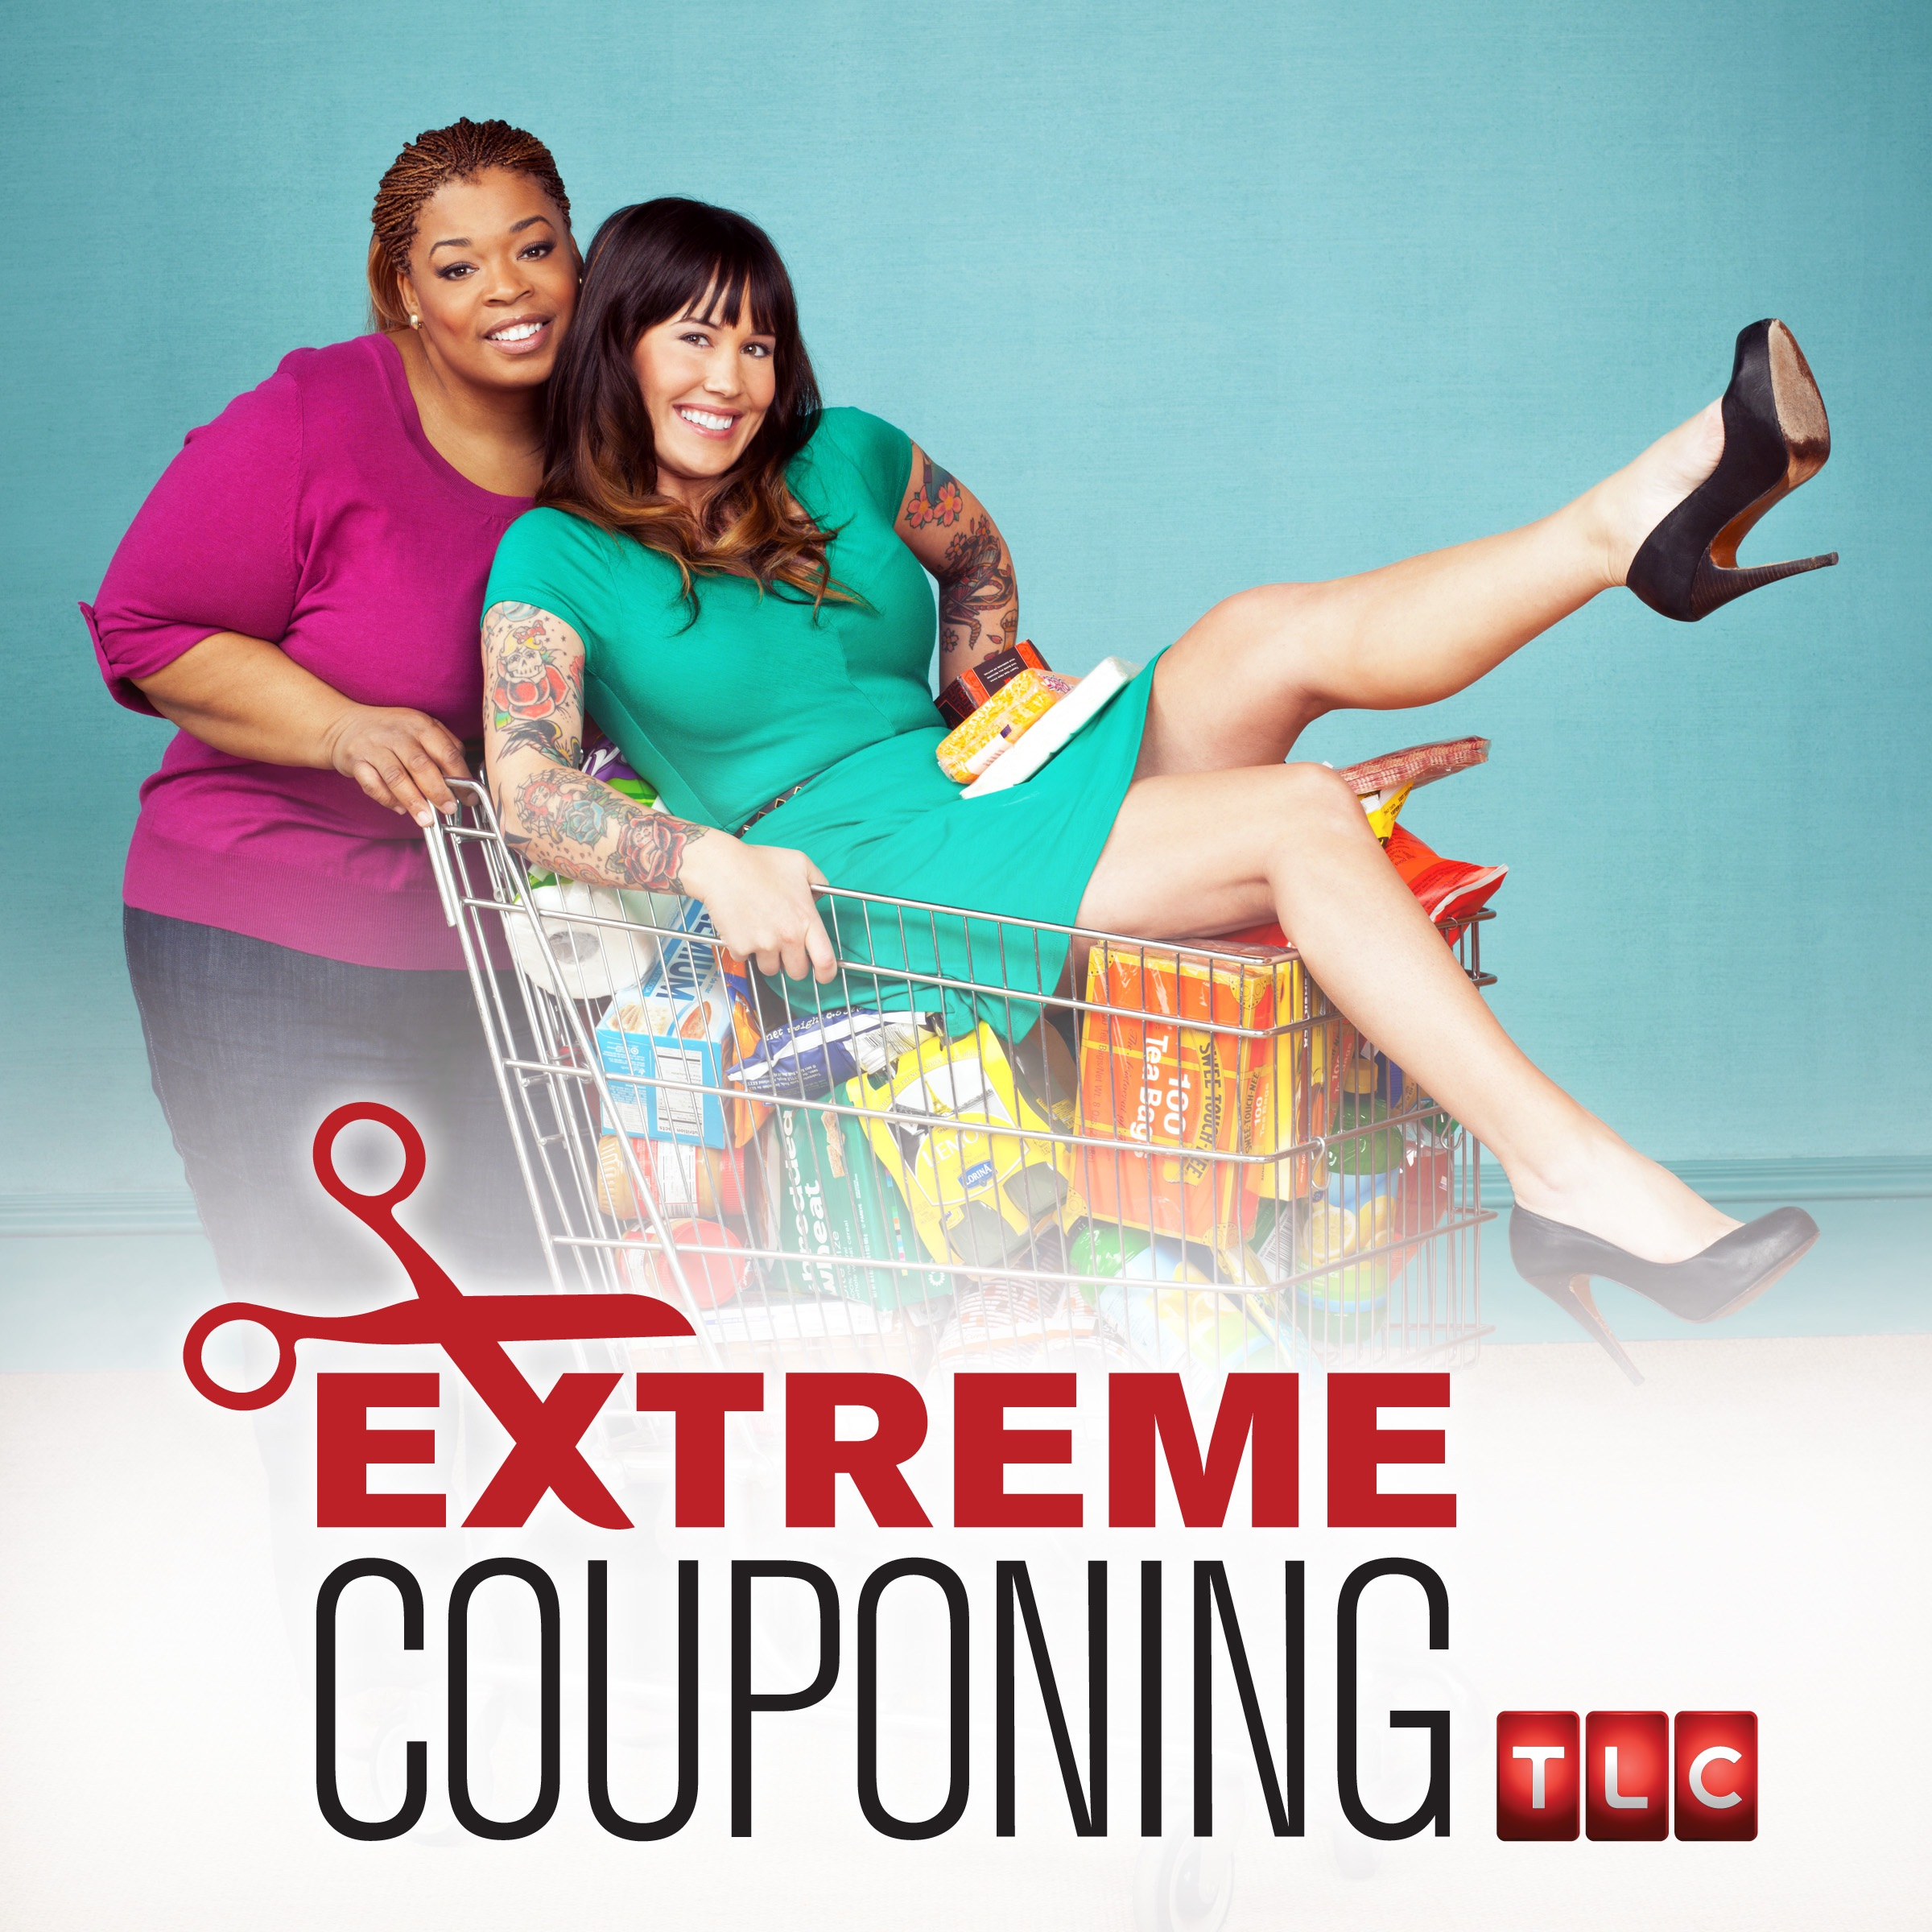 Extreme couponing show episodes